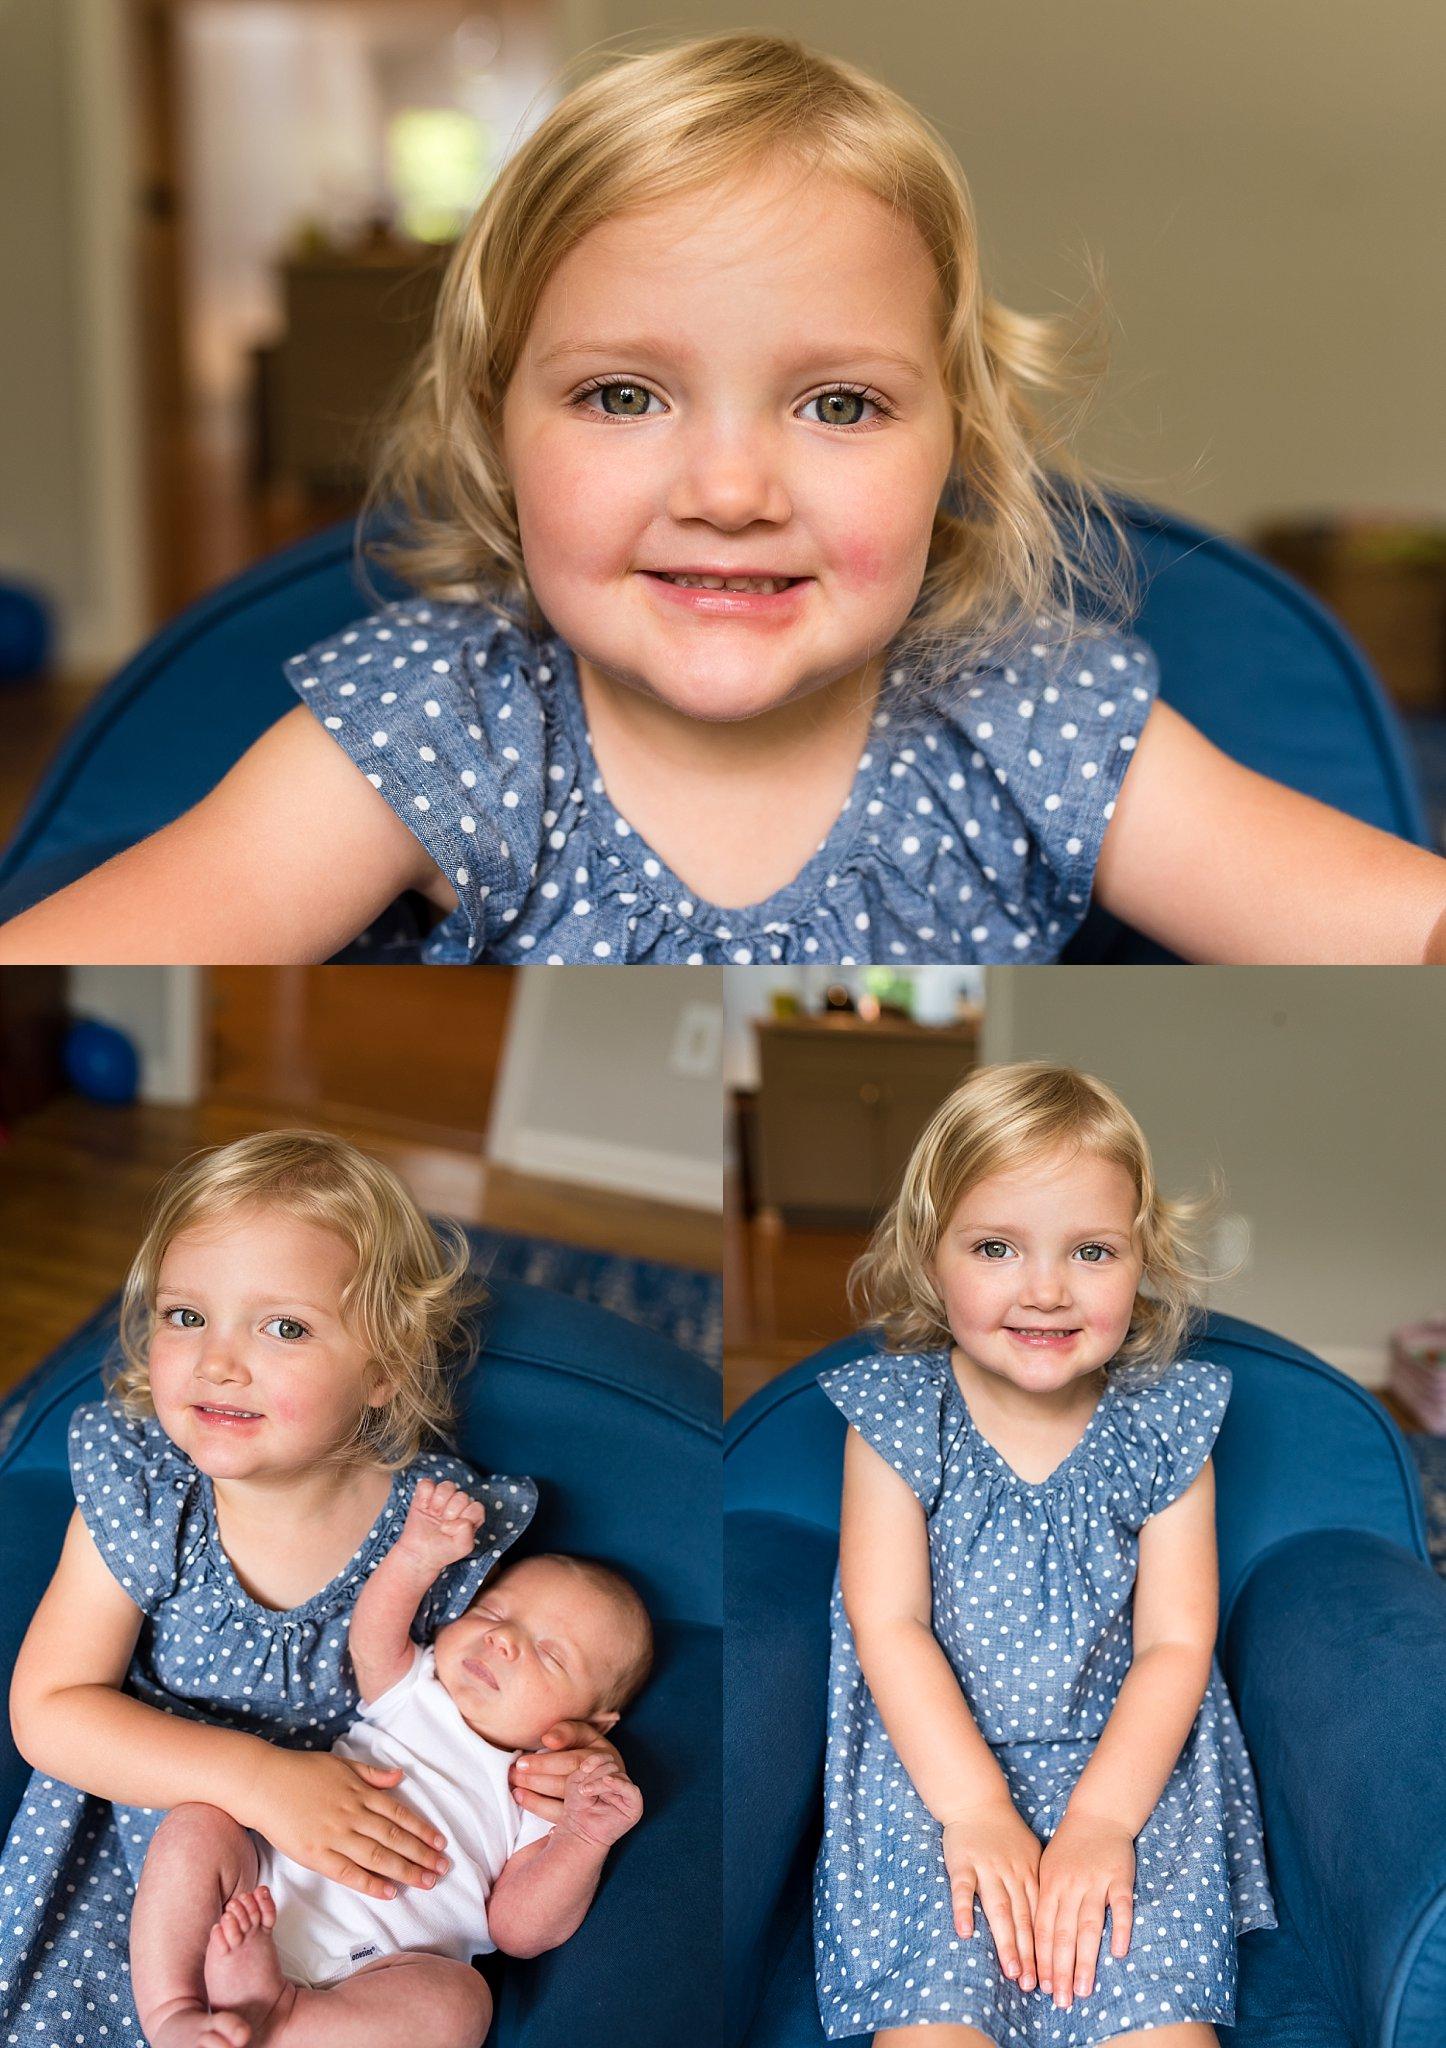 atlanta-family-photographers-decatur-newborn-photography (4).jpg